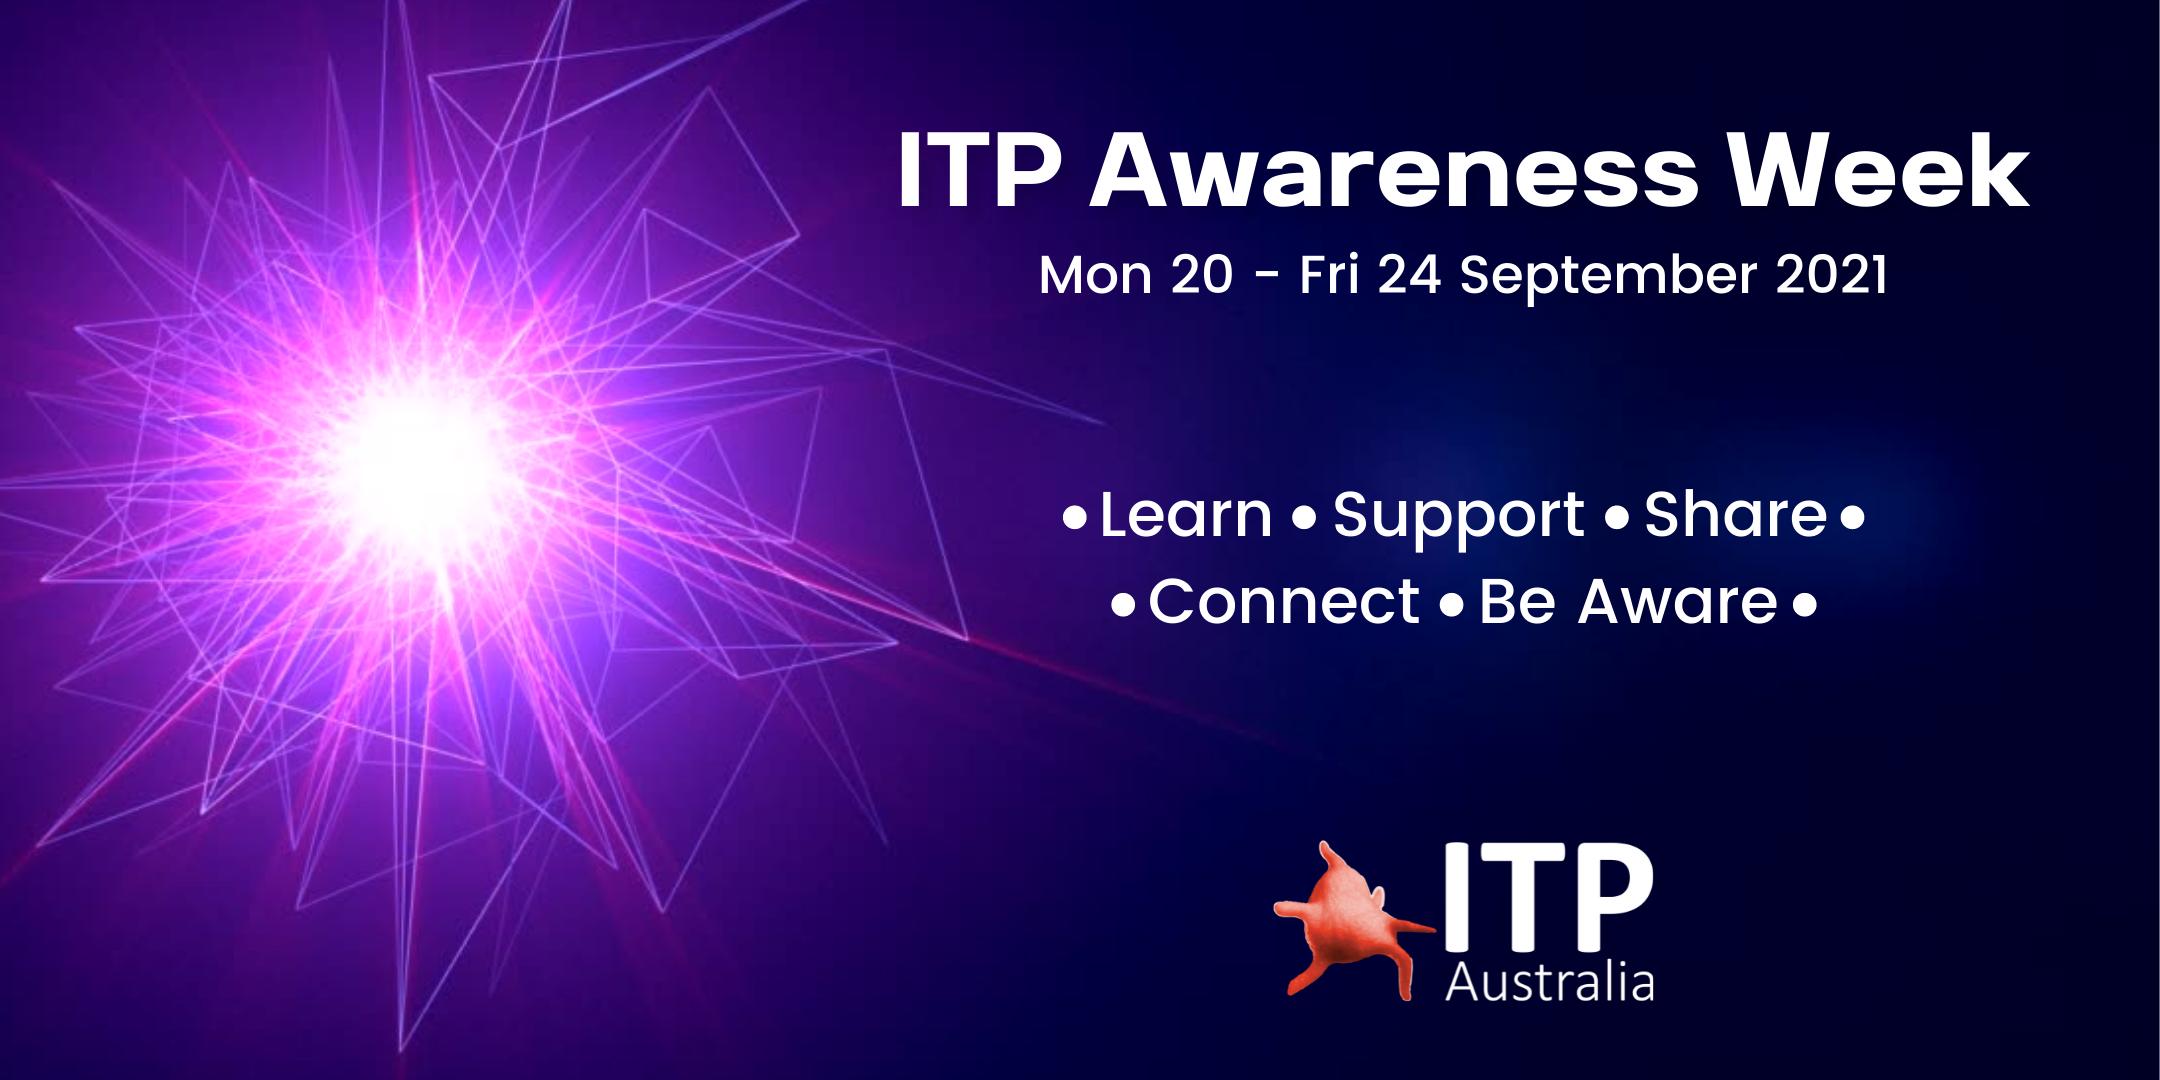 2021 ITP Awareness Week